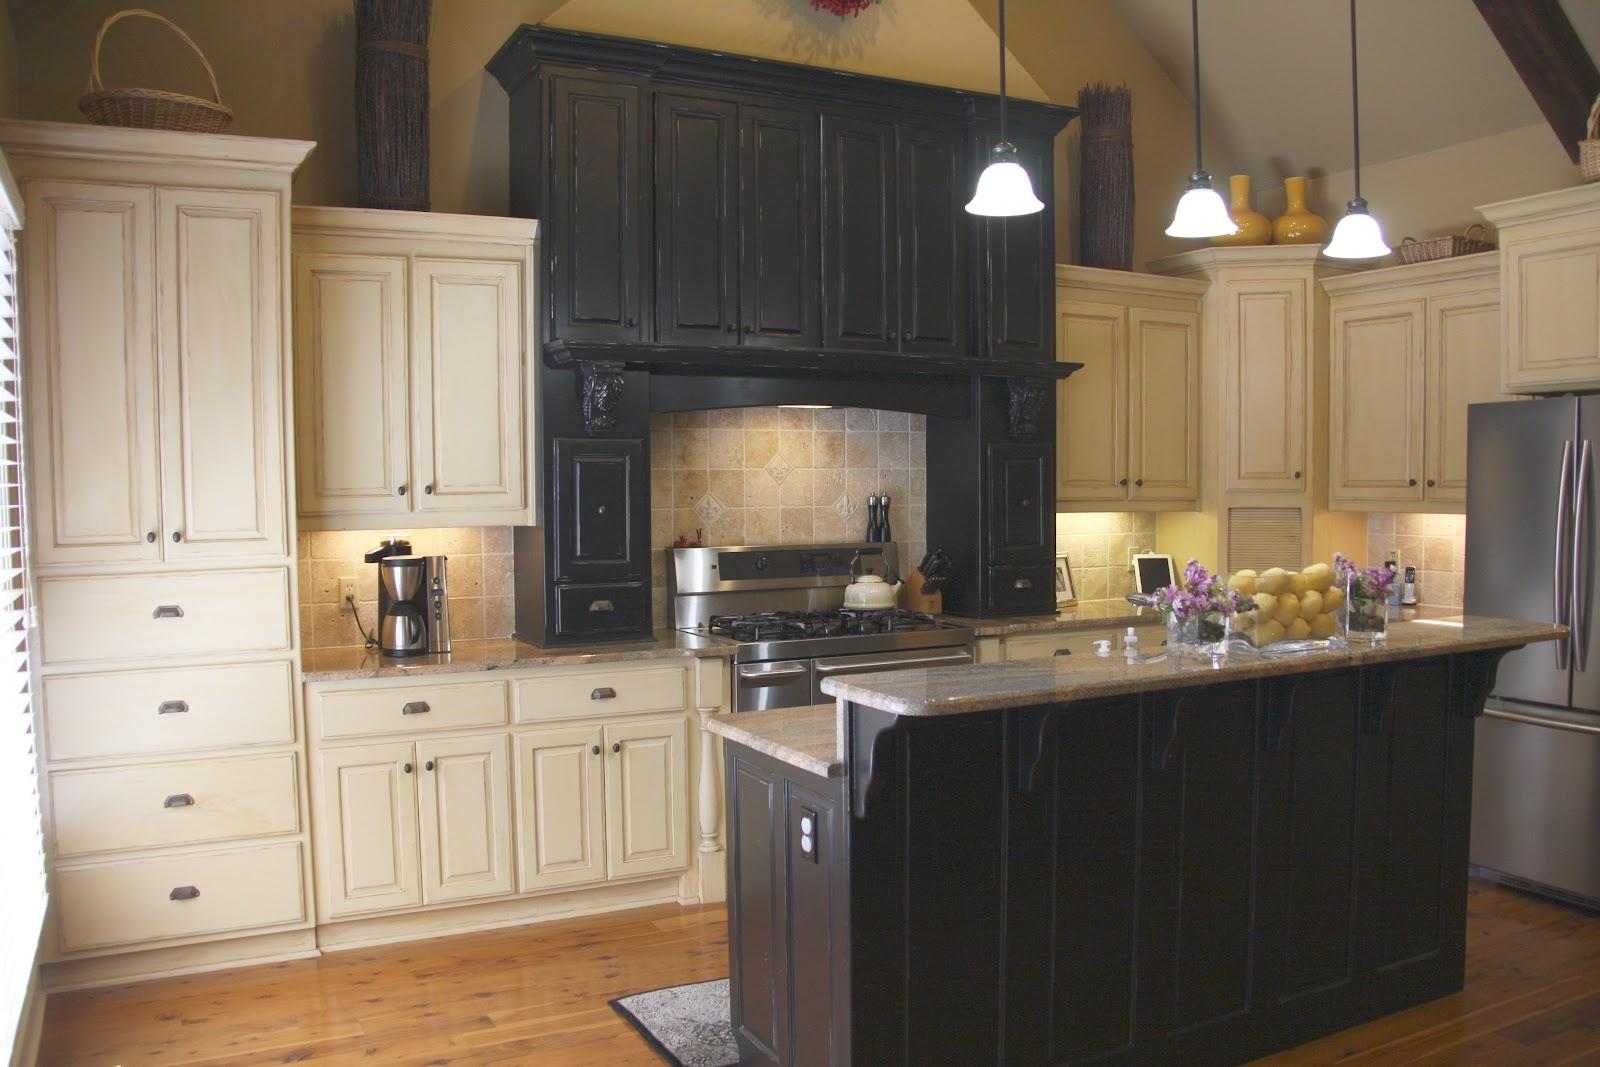 organized kitchen cabinets - simply organized